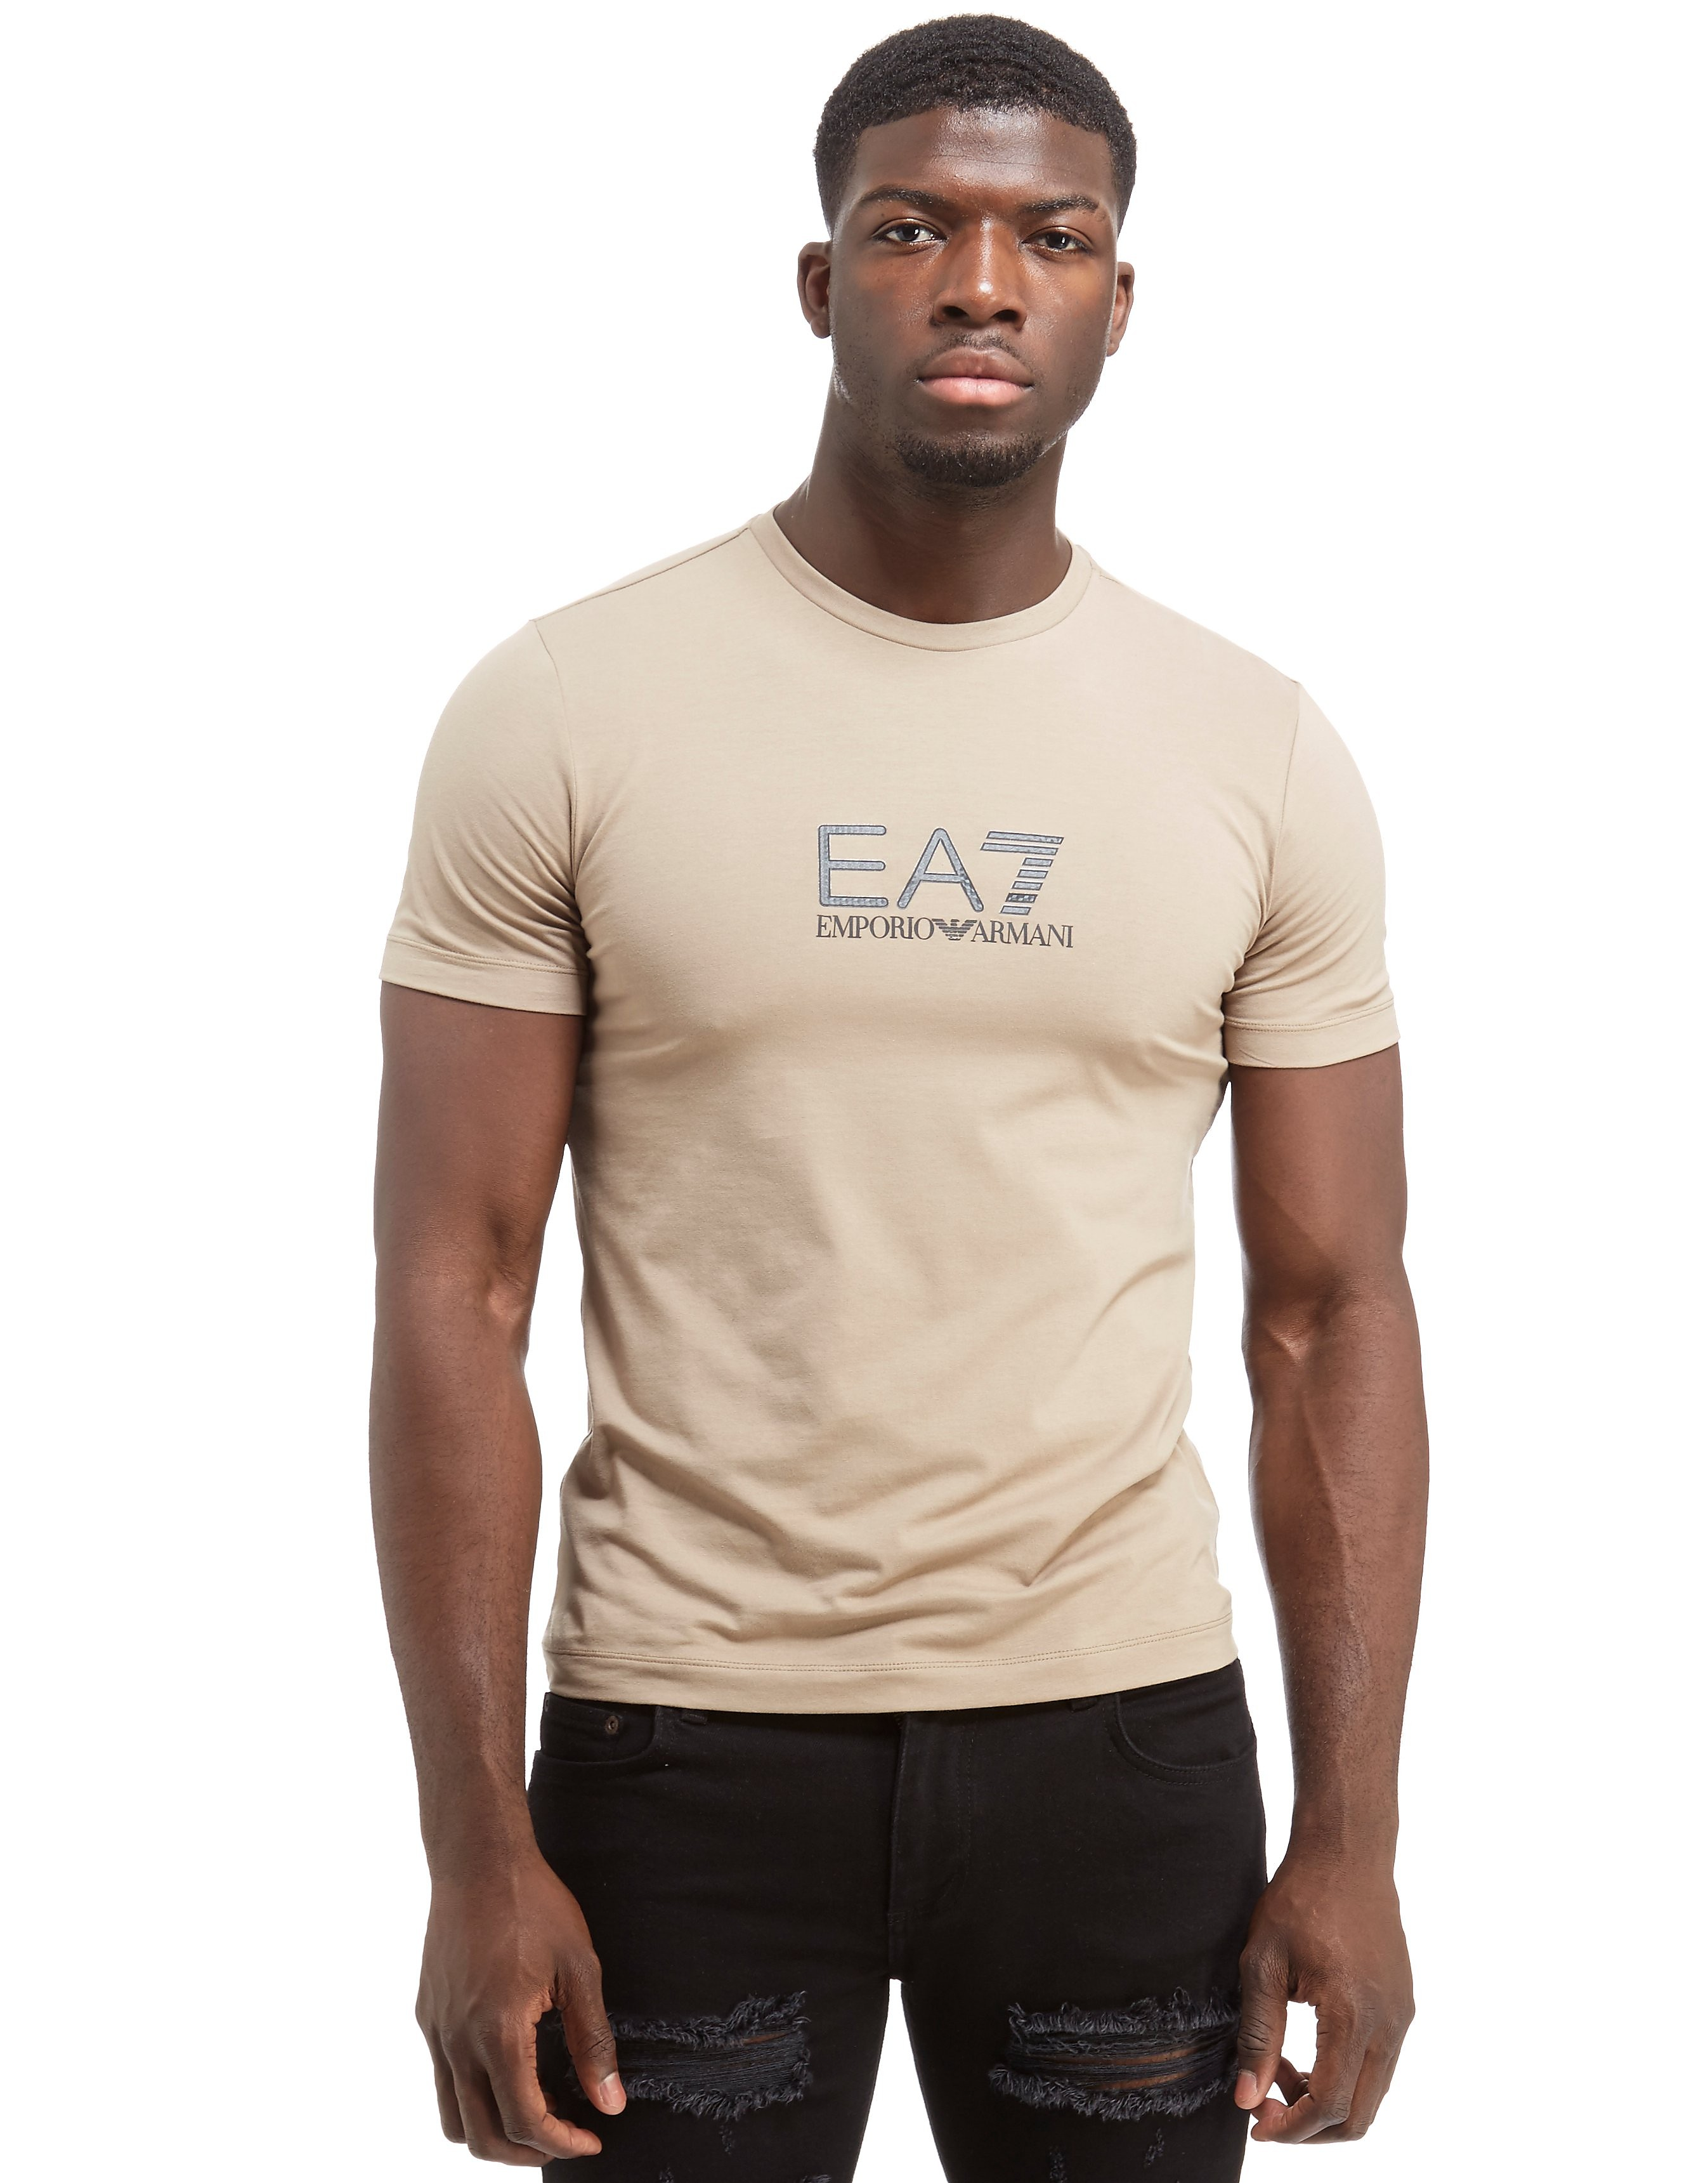 Emporio Armani EA7 Carbon Print Short Sleeve T-Shirt